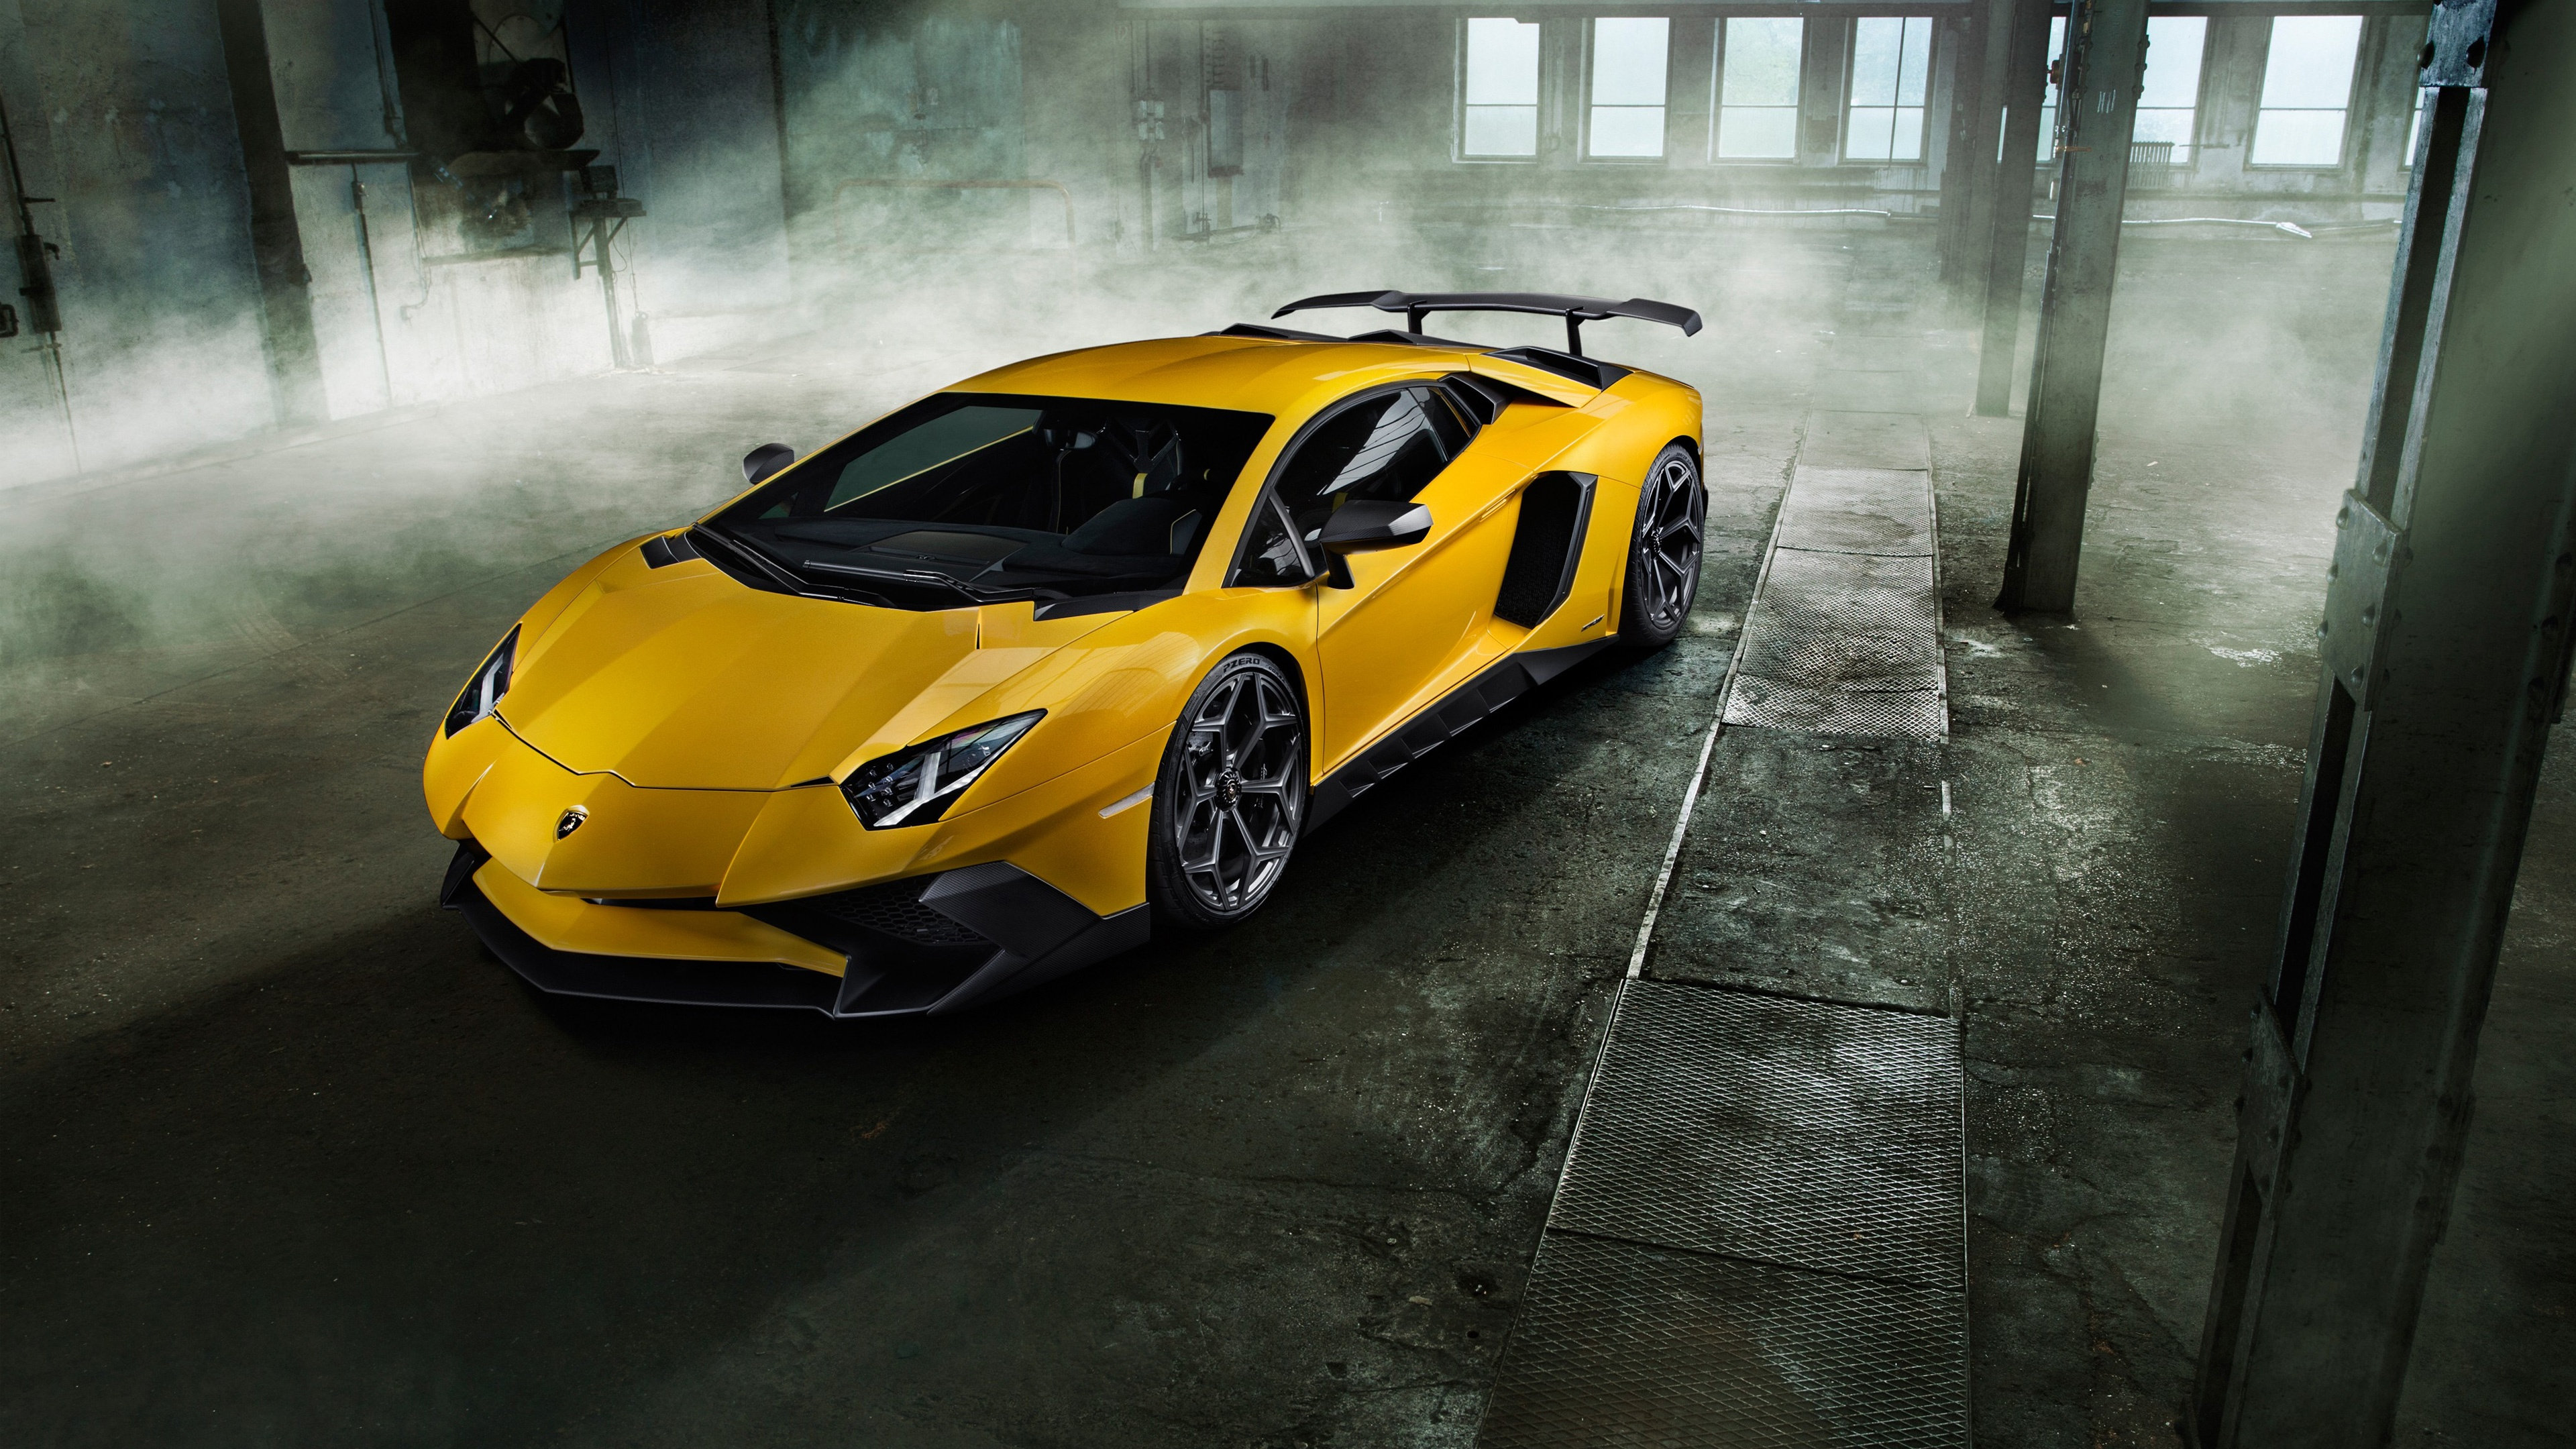 Lamborghini Aventador Superveloce Wallpapers Auto Electrical. Lamborghini Aventador 4k Wallpaper 3840x2160. Honda. Honda Civic Fuse Box Panel Diagram Aventador At Scoala.co